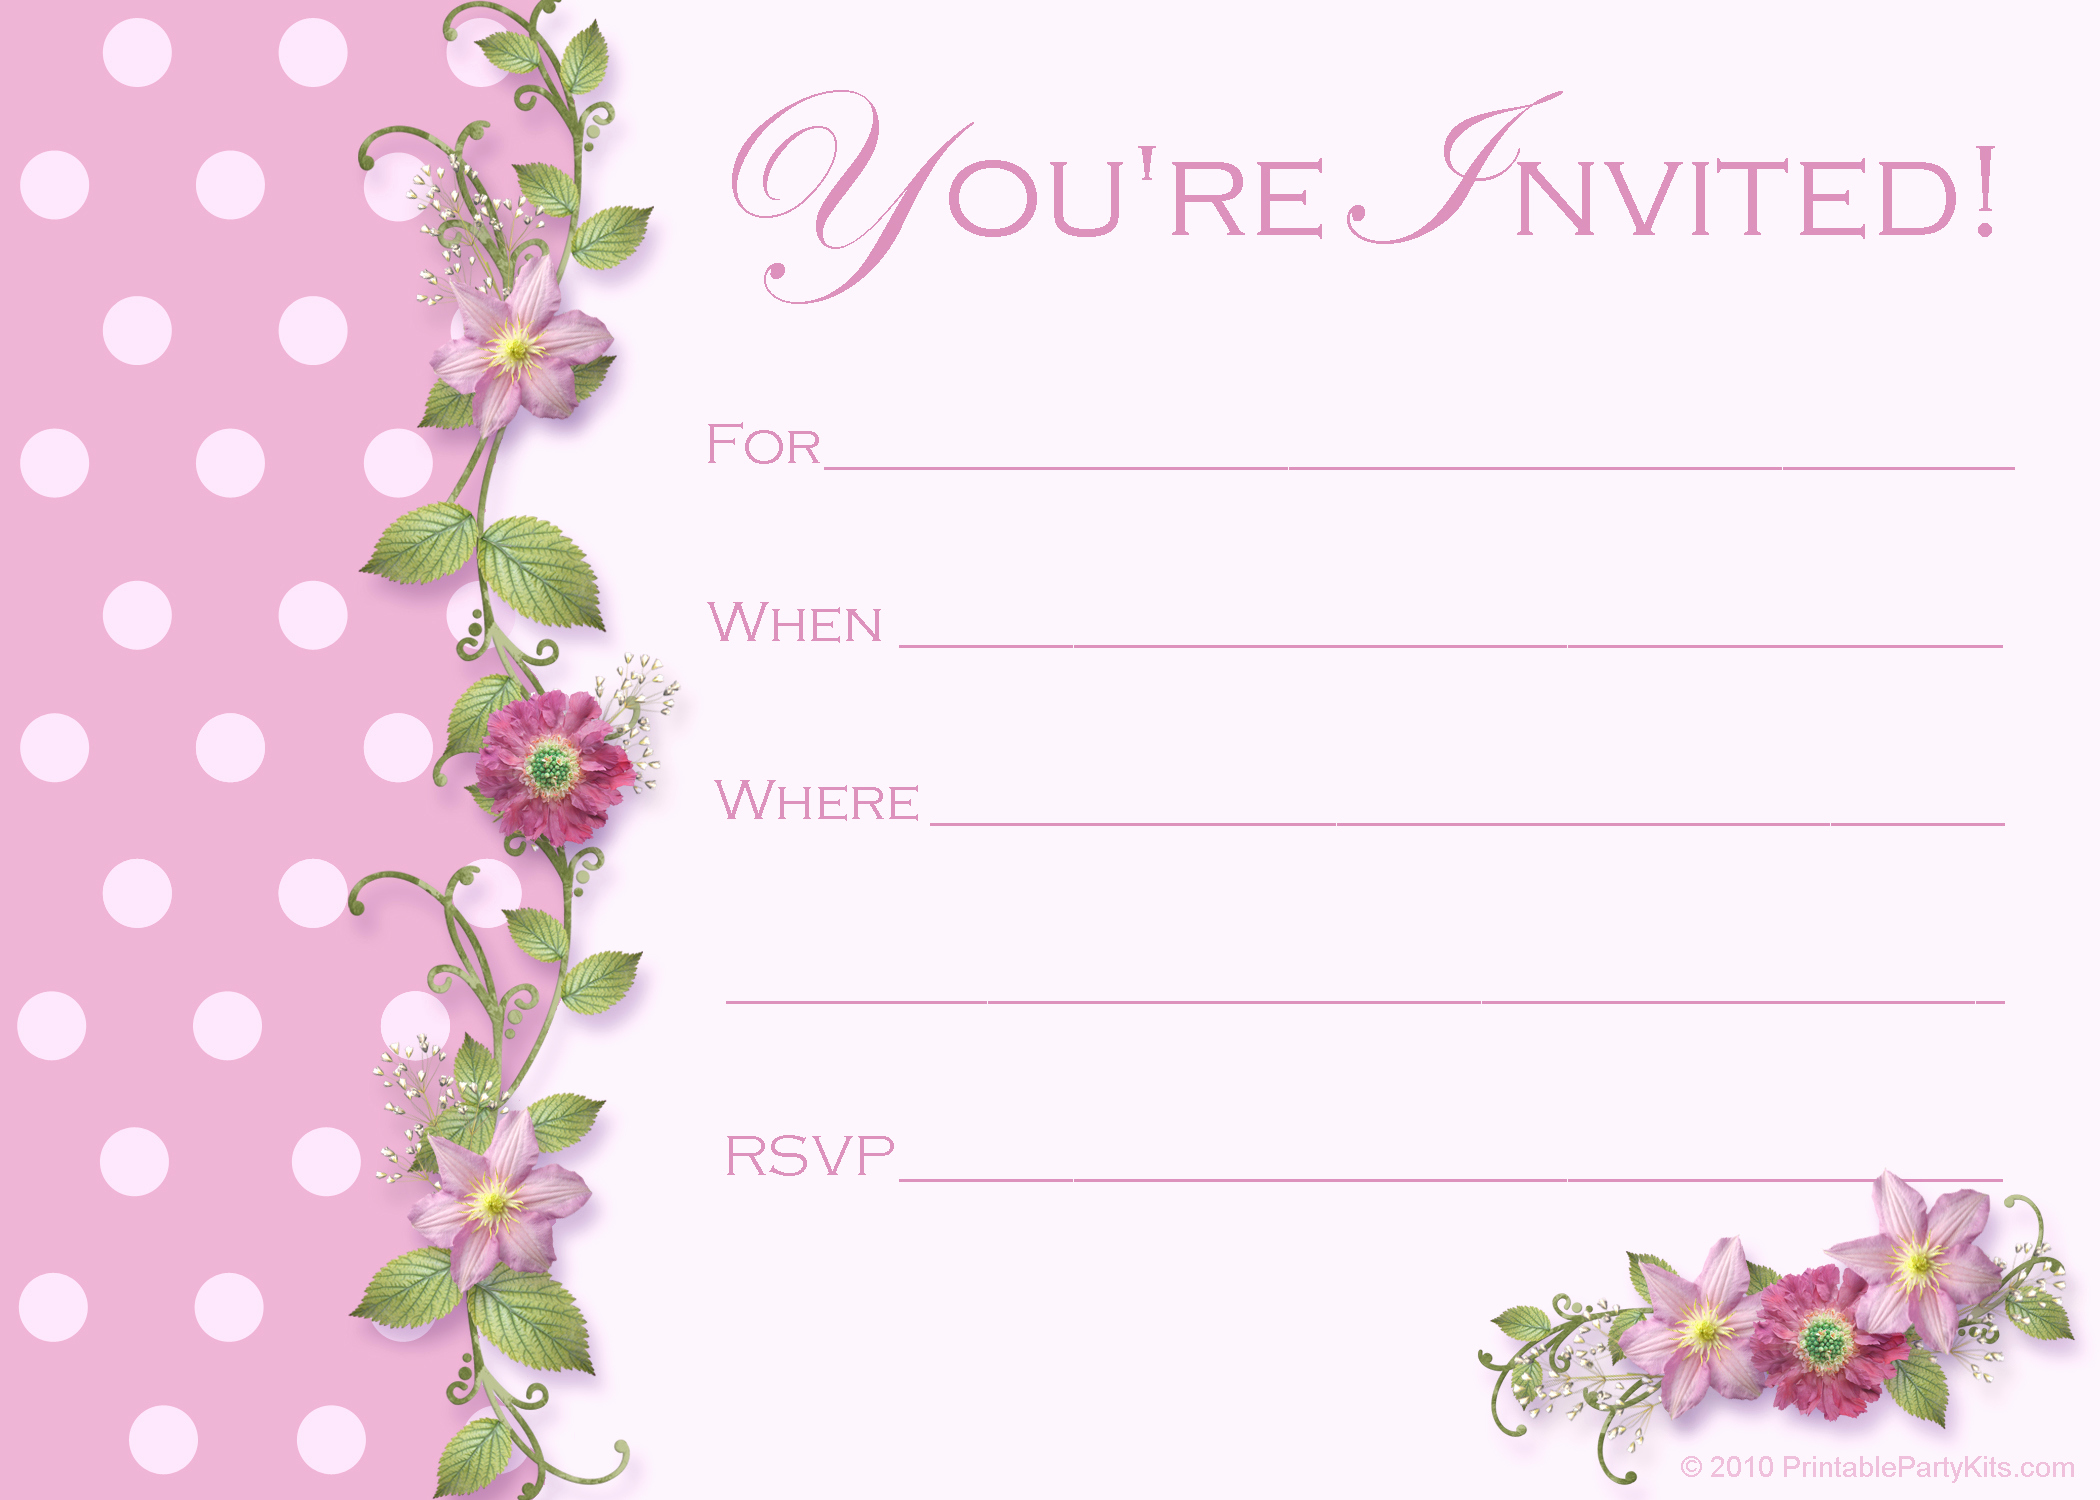 Free Anniversary Invitation Templates Lovely Free Sweet 16 Birthday Invitations – Free Printable